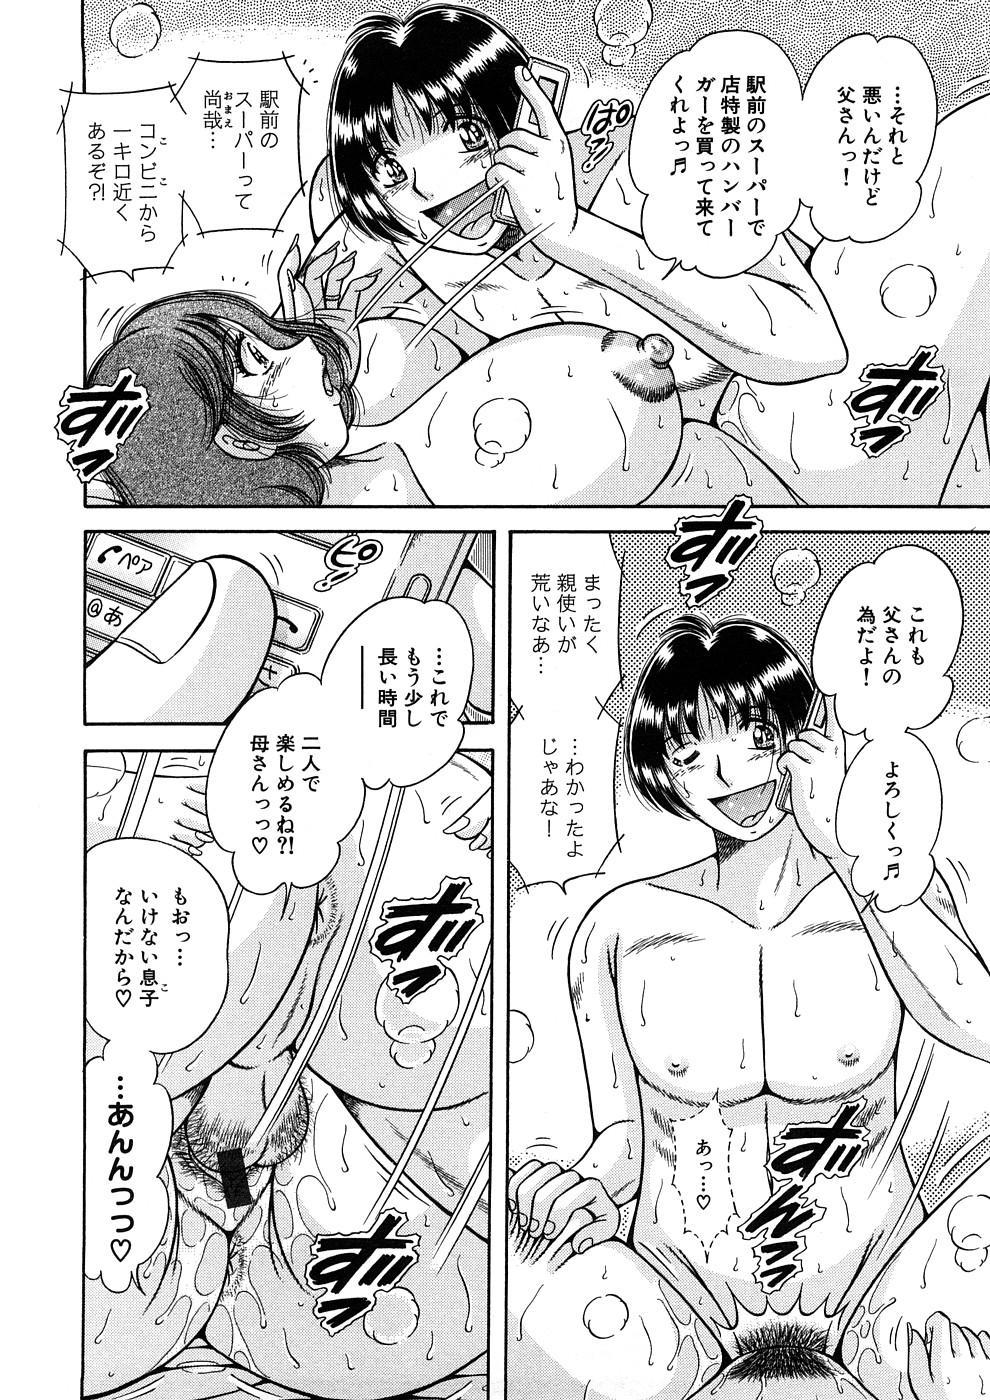 Geki Yaba Anthology Vol. 1 - Naka ni Dashite yo 212